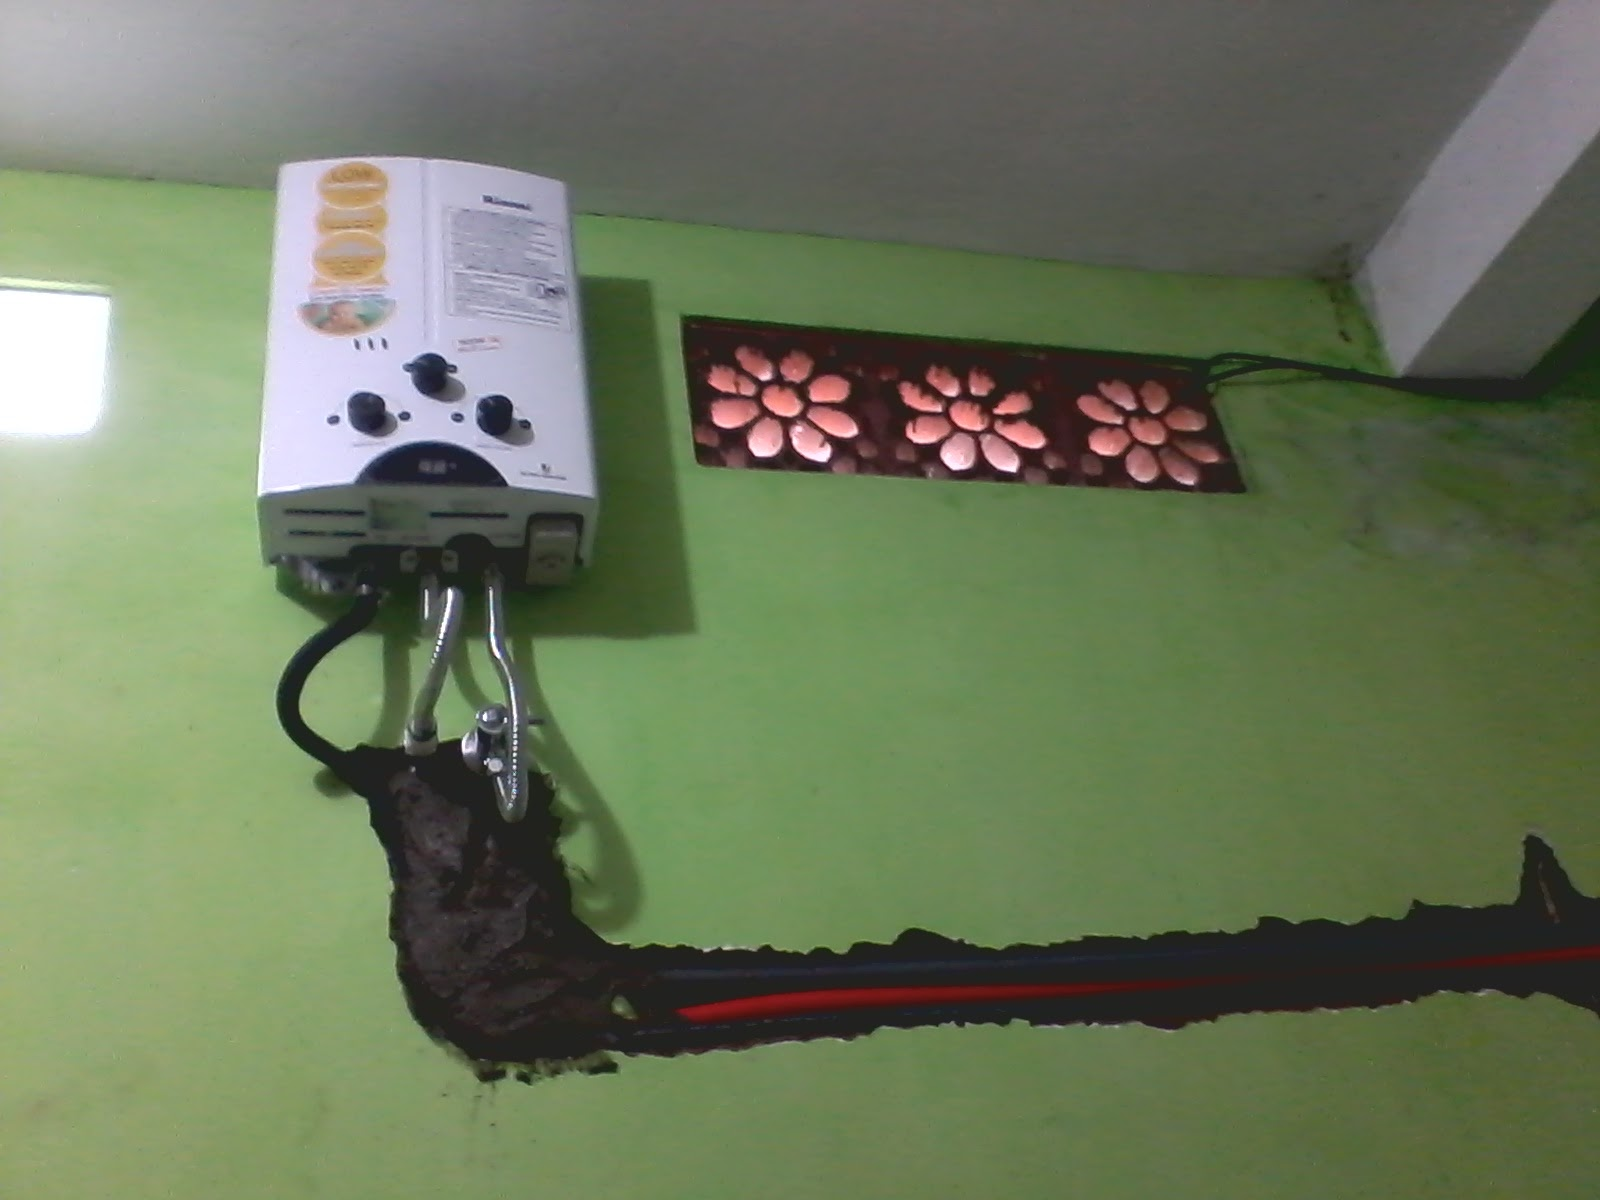 Service Dan Pasang Water Heater Malang Surya Heater Galeri Foto Surya Water Heater Malang